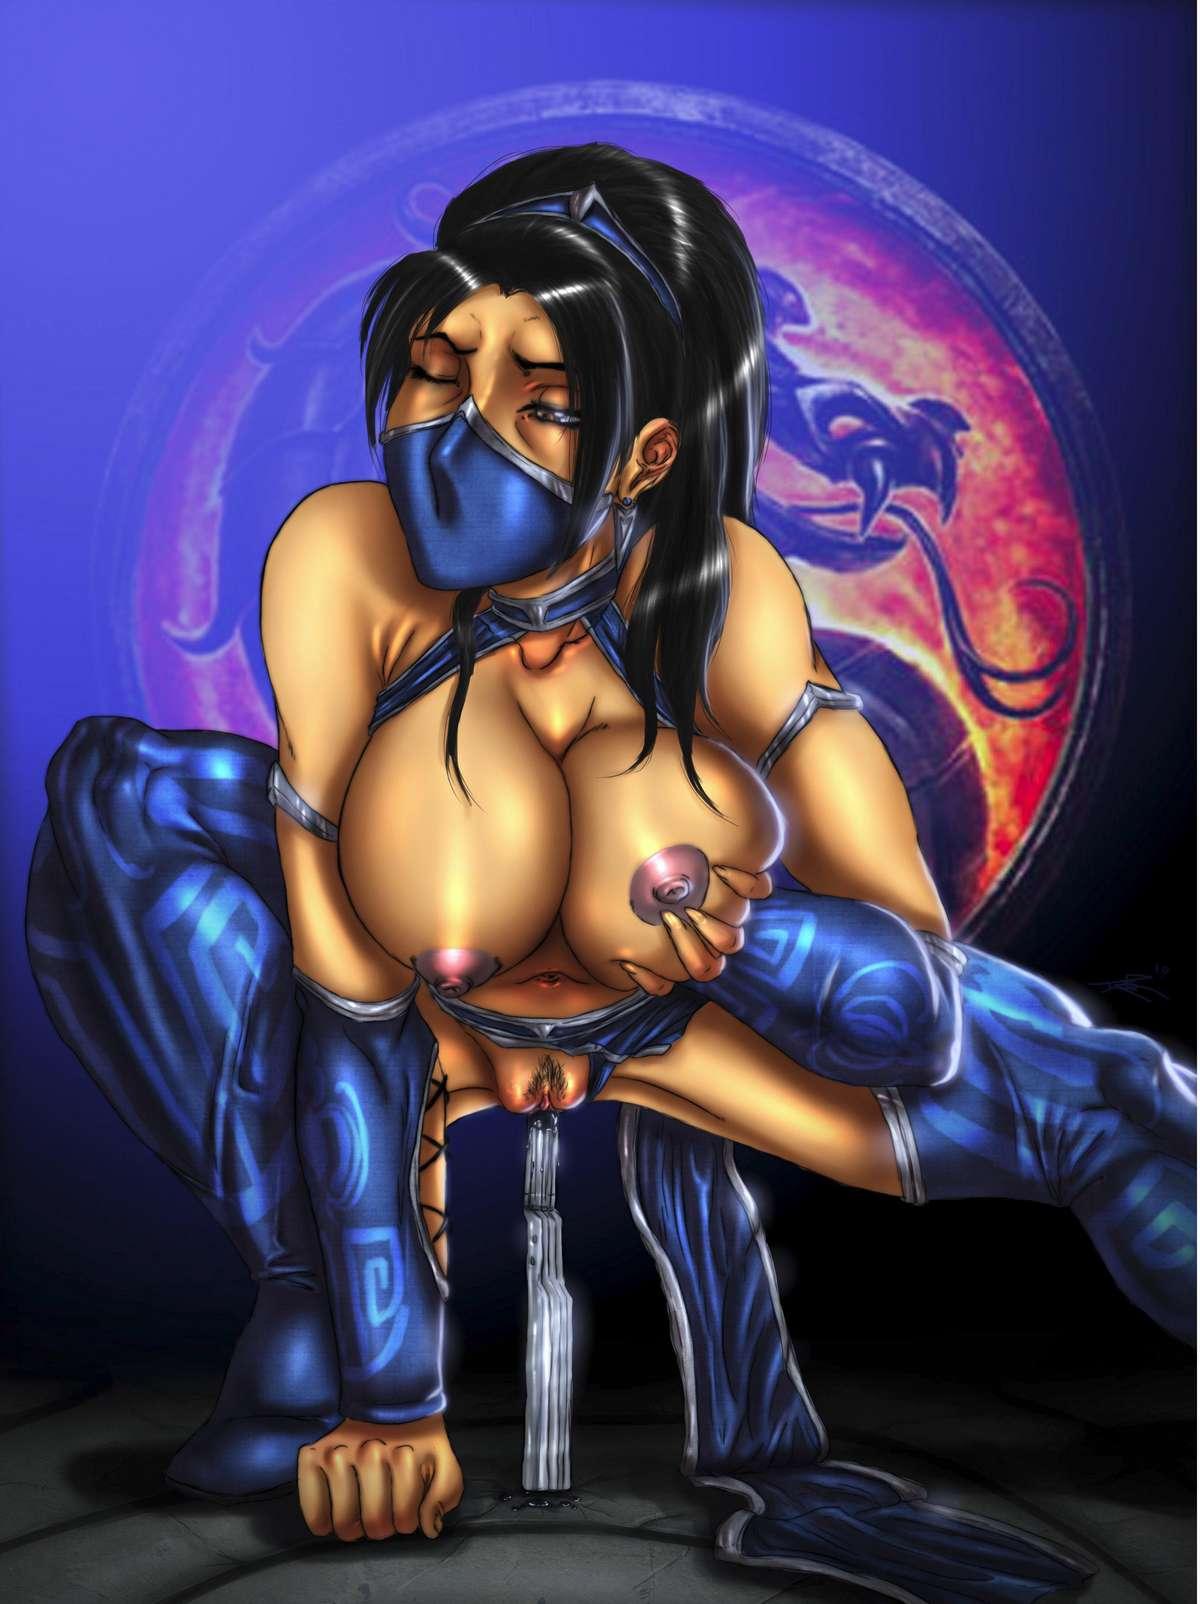 Mortal kombat nude nakedmod 2013 gameplay download anime galleries